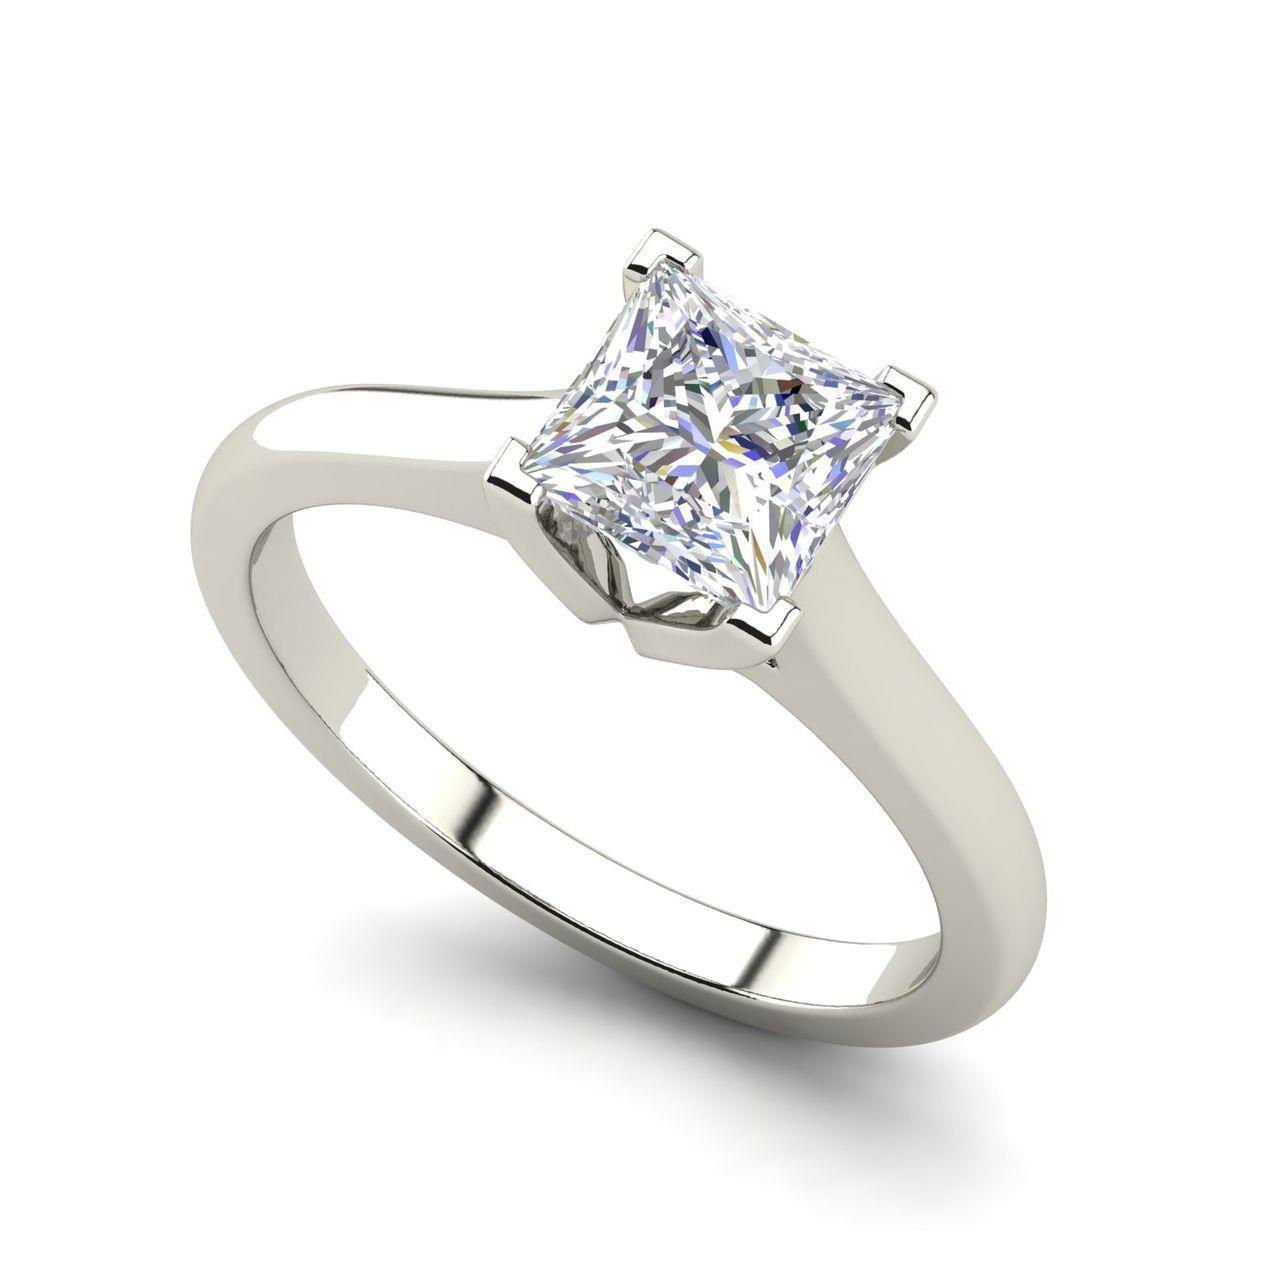 Solitaire 1 Carat Vvs2 F Princess Cut Diamond Engagement Ring White Gold Ebay